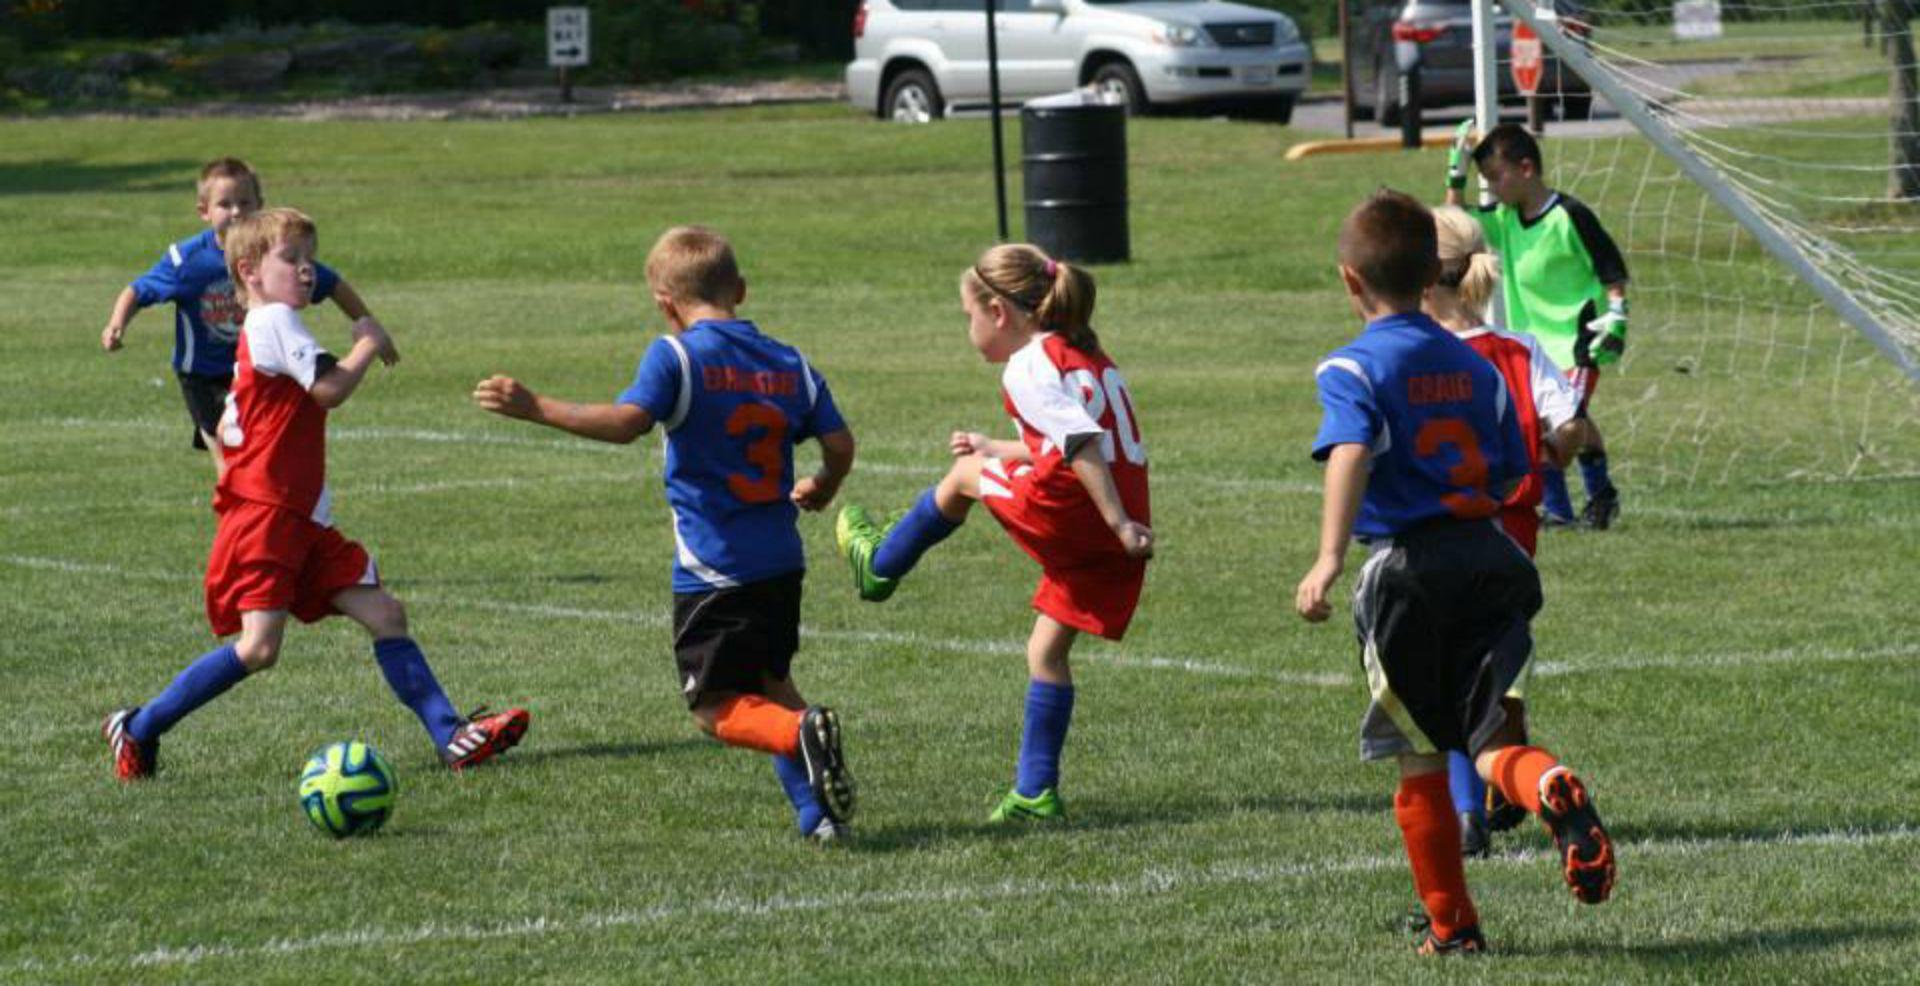 Youth Soccer Program - West Plains Soccer Association